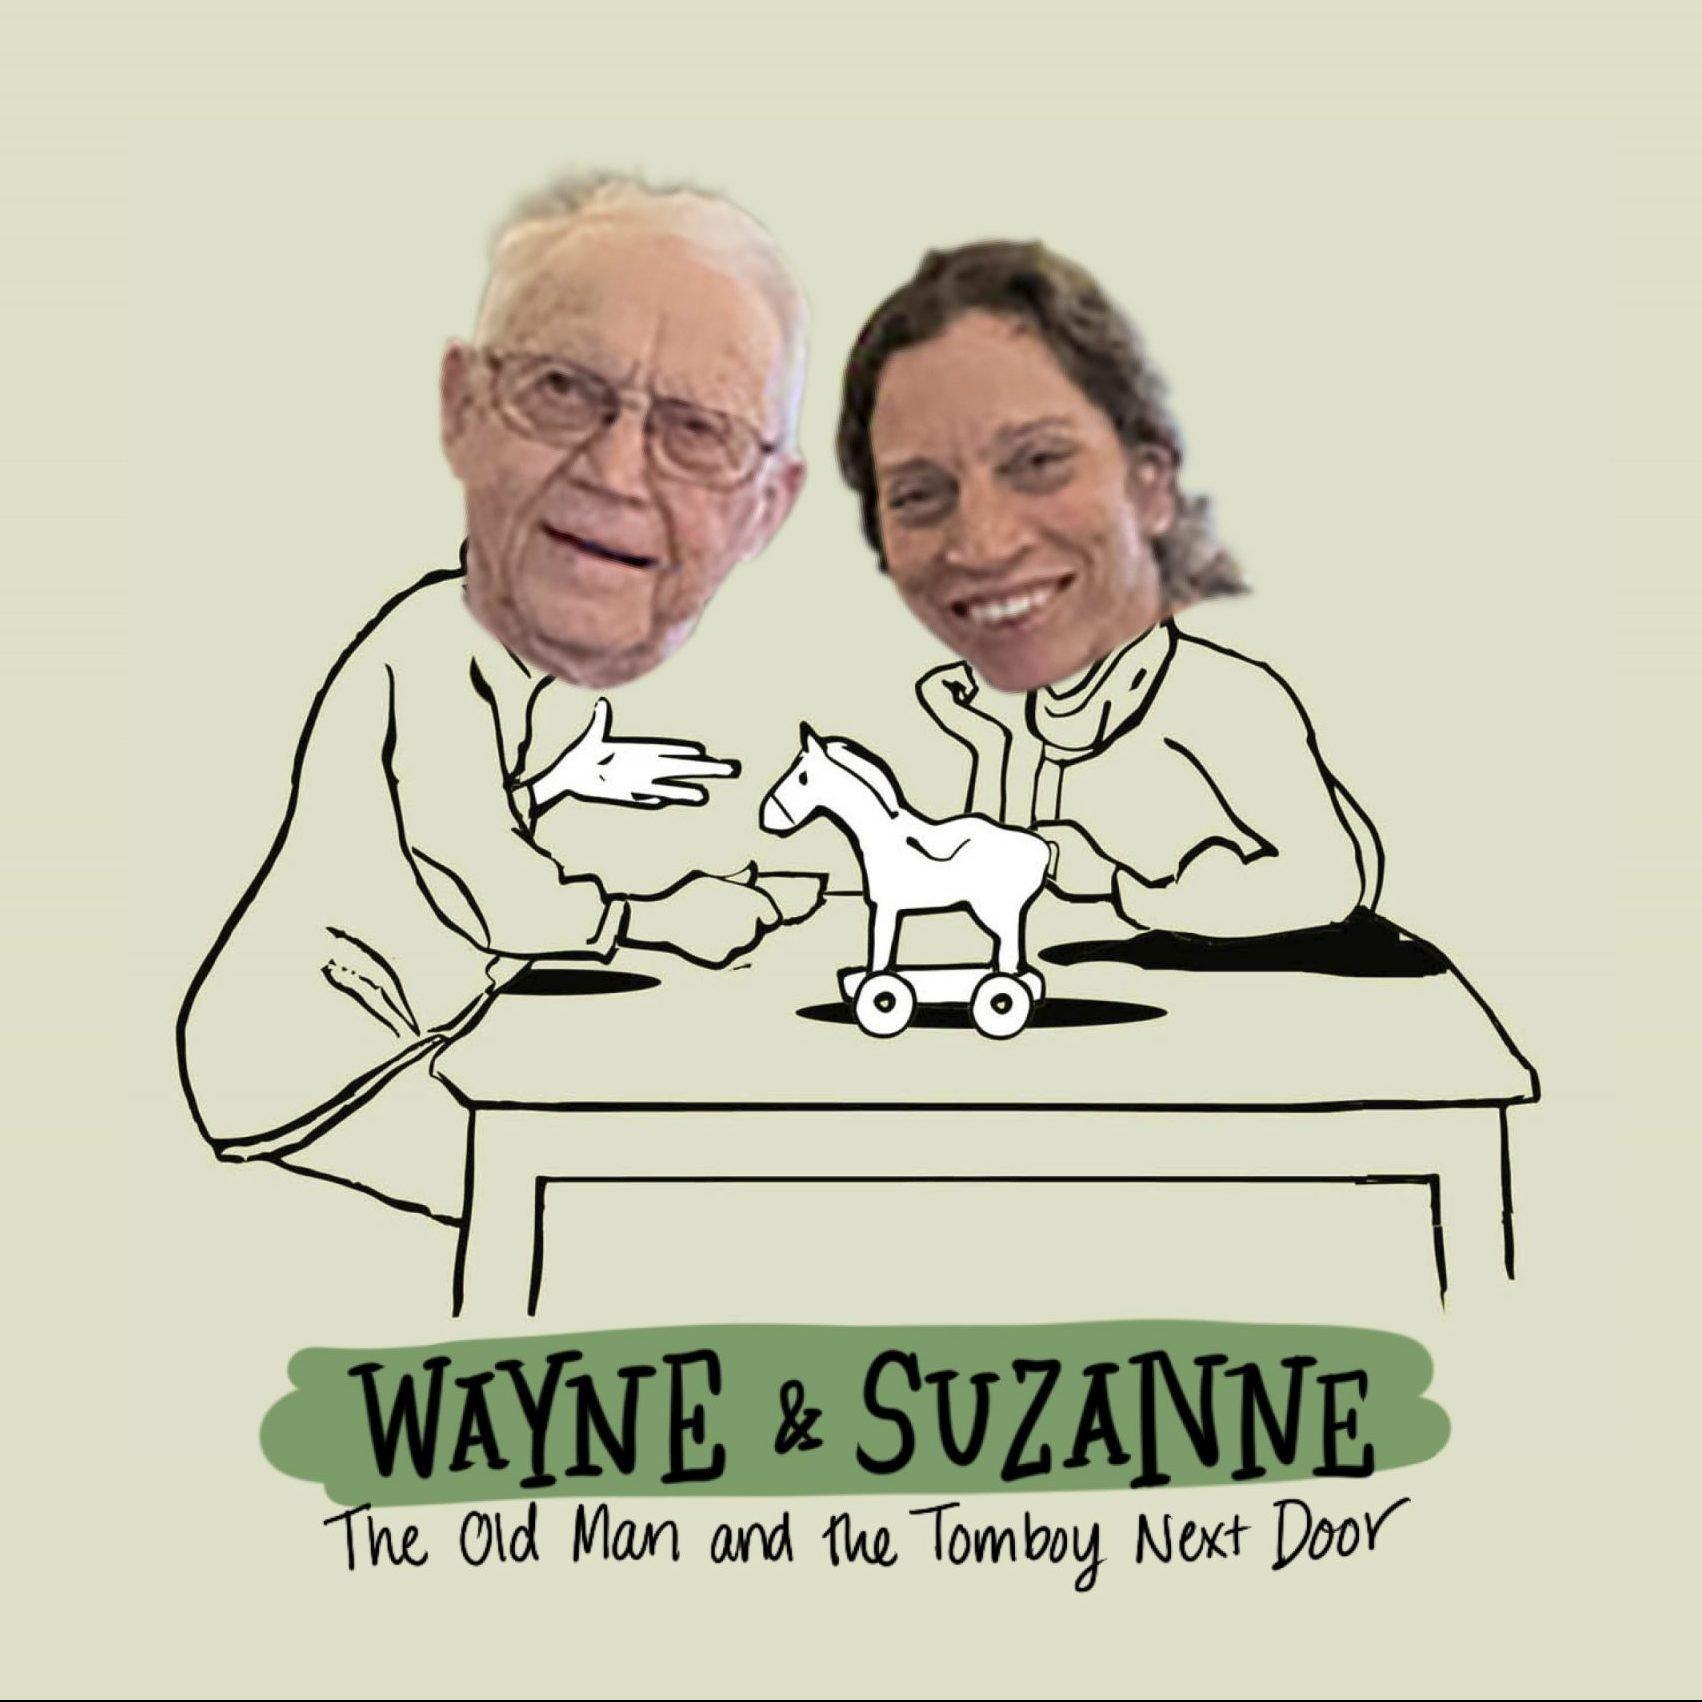 Wayne & Suzanne